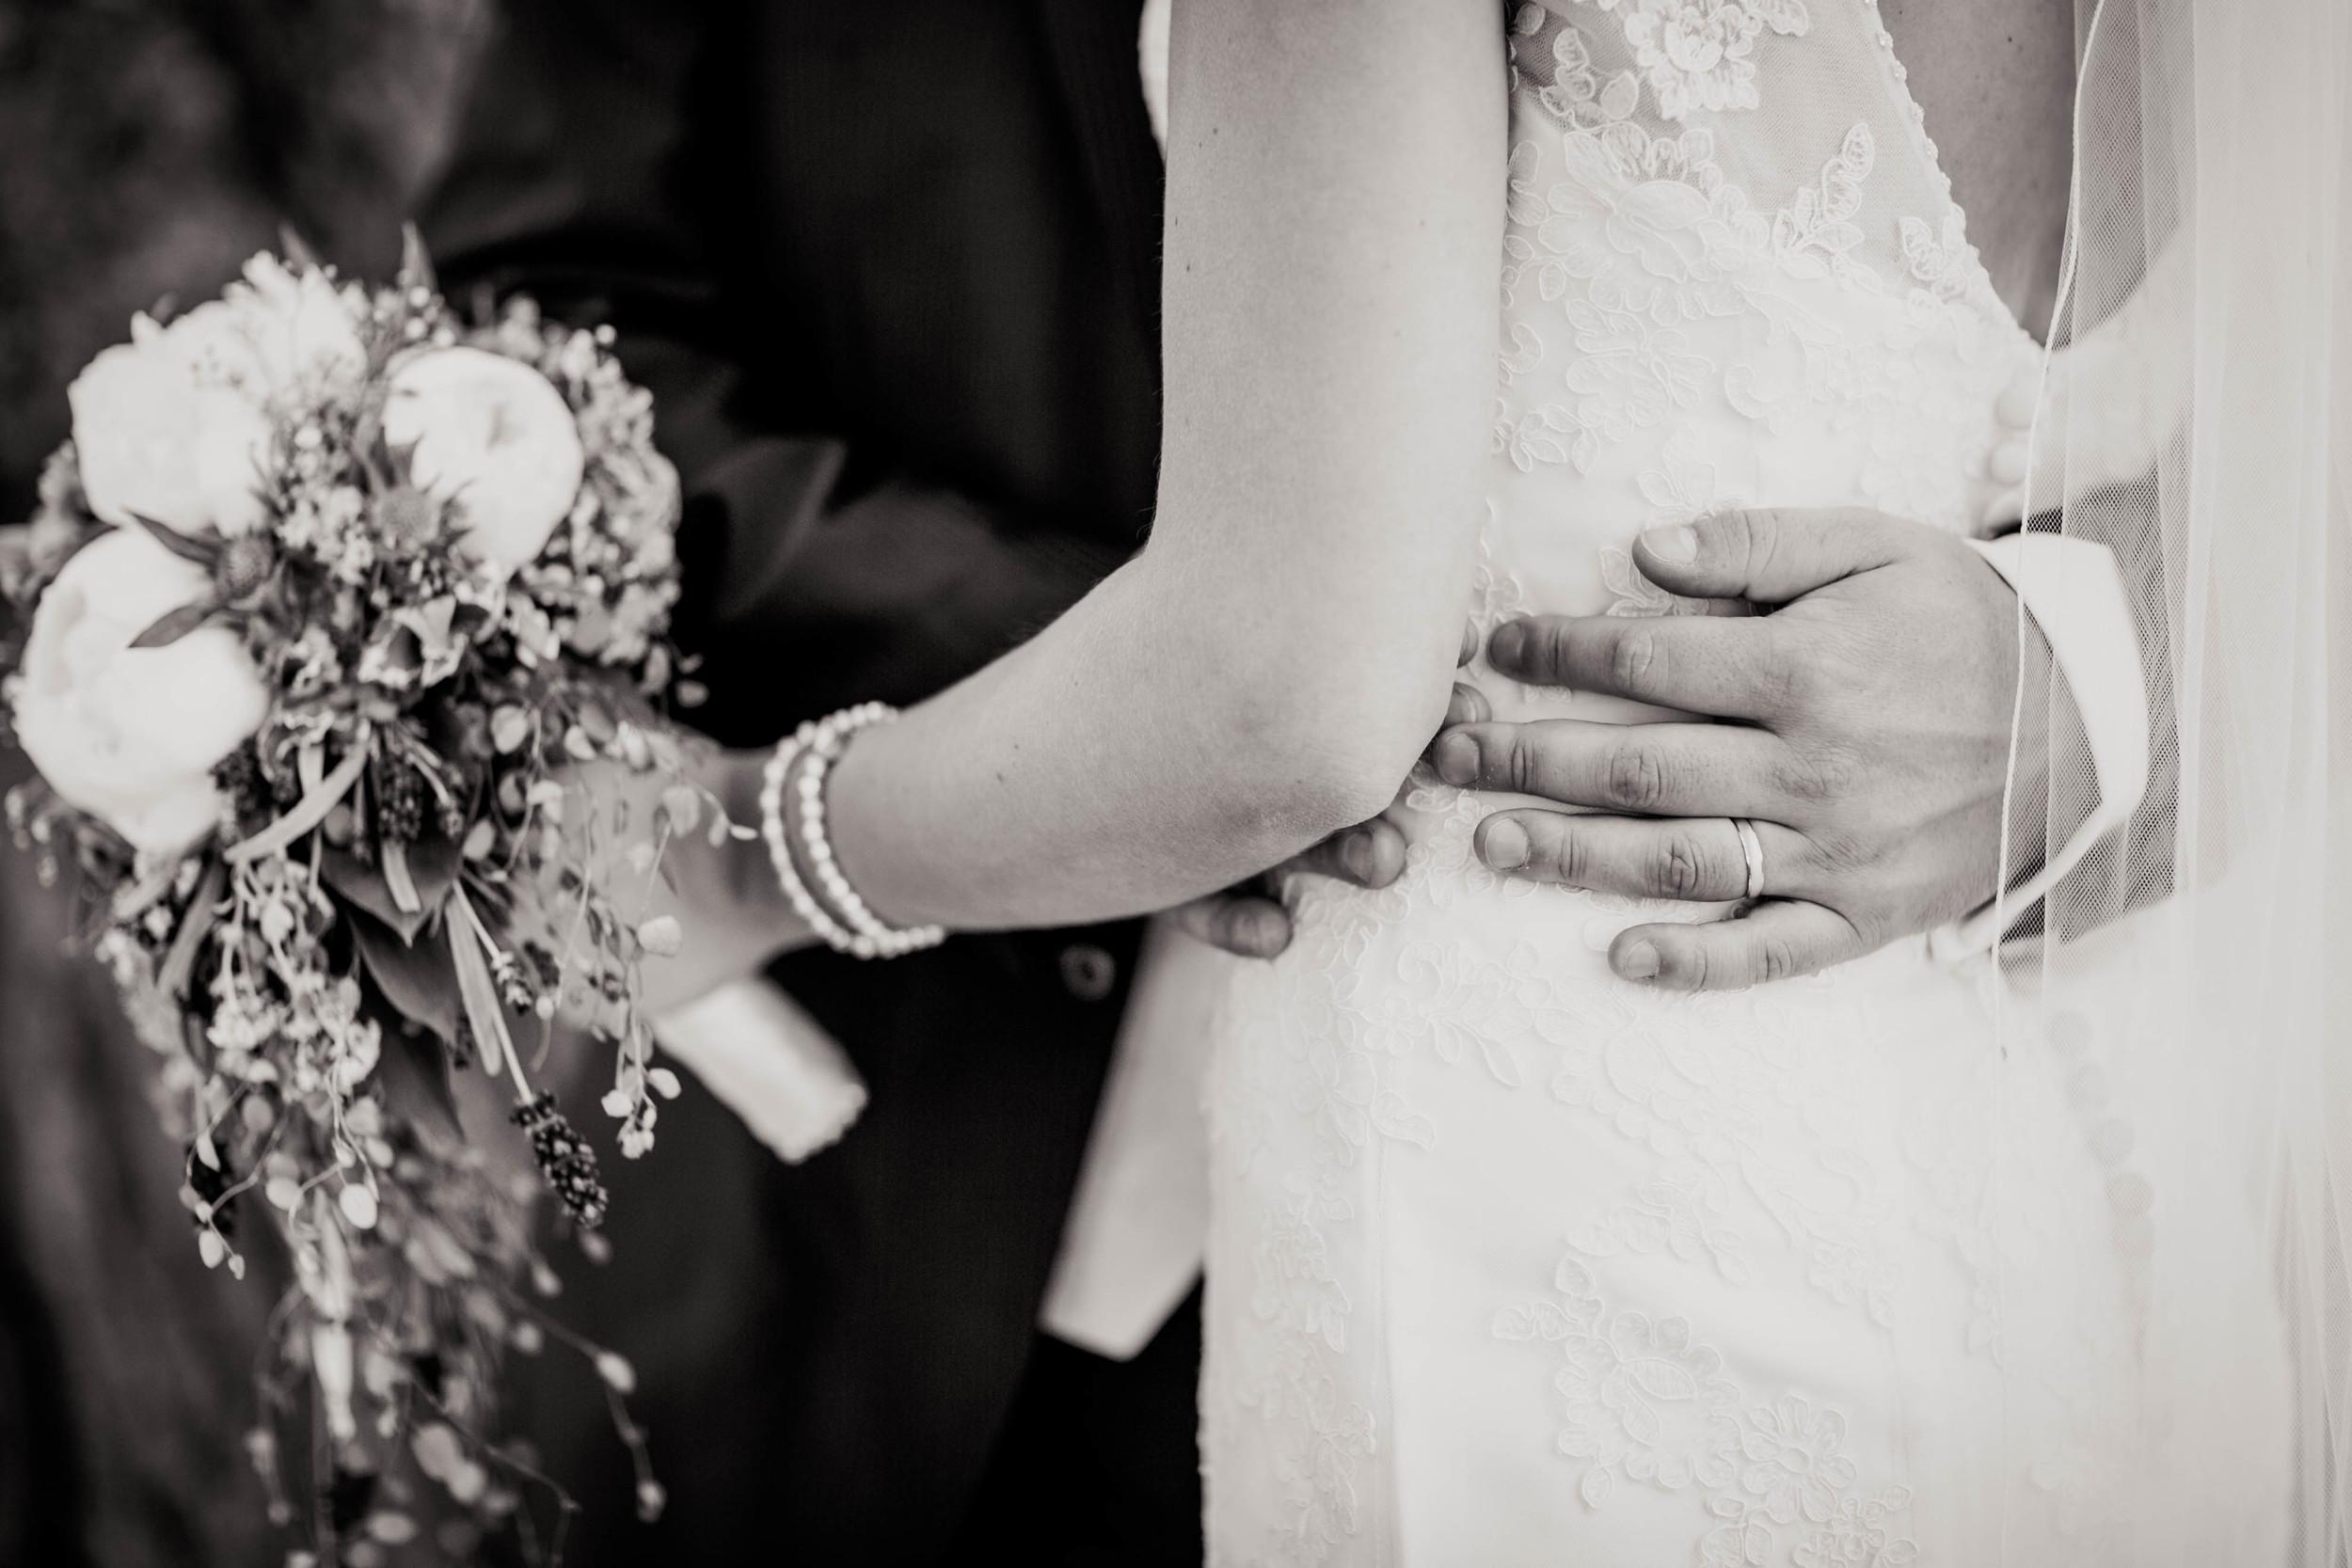 Hochzeitsfotografie Berlin_Fran Burrows Fotografie-201.jpg